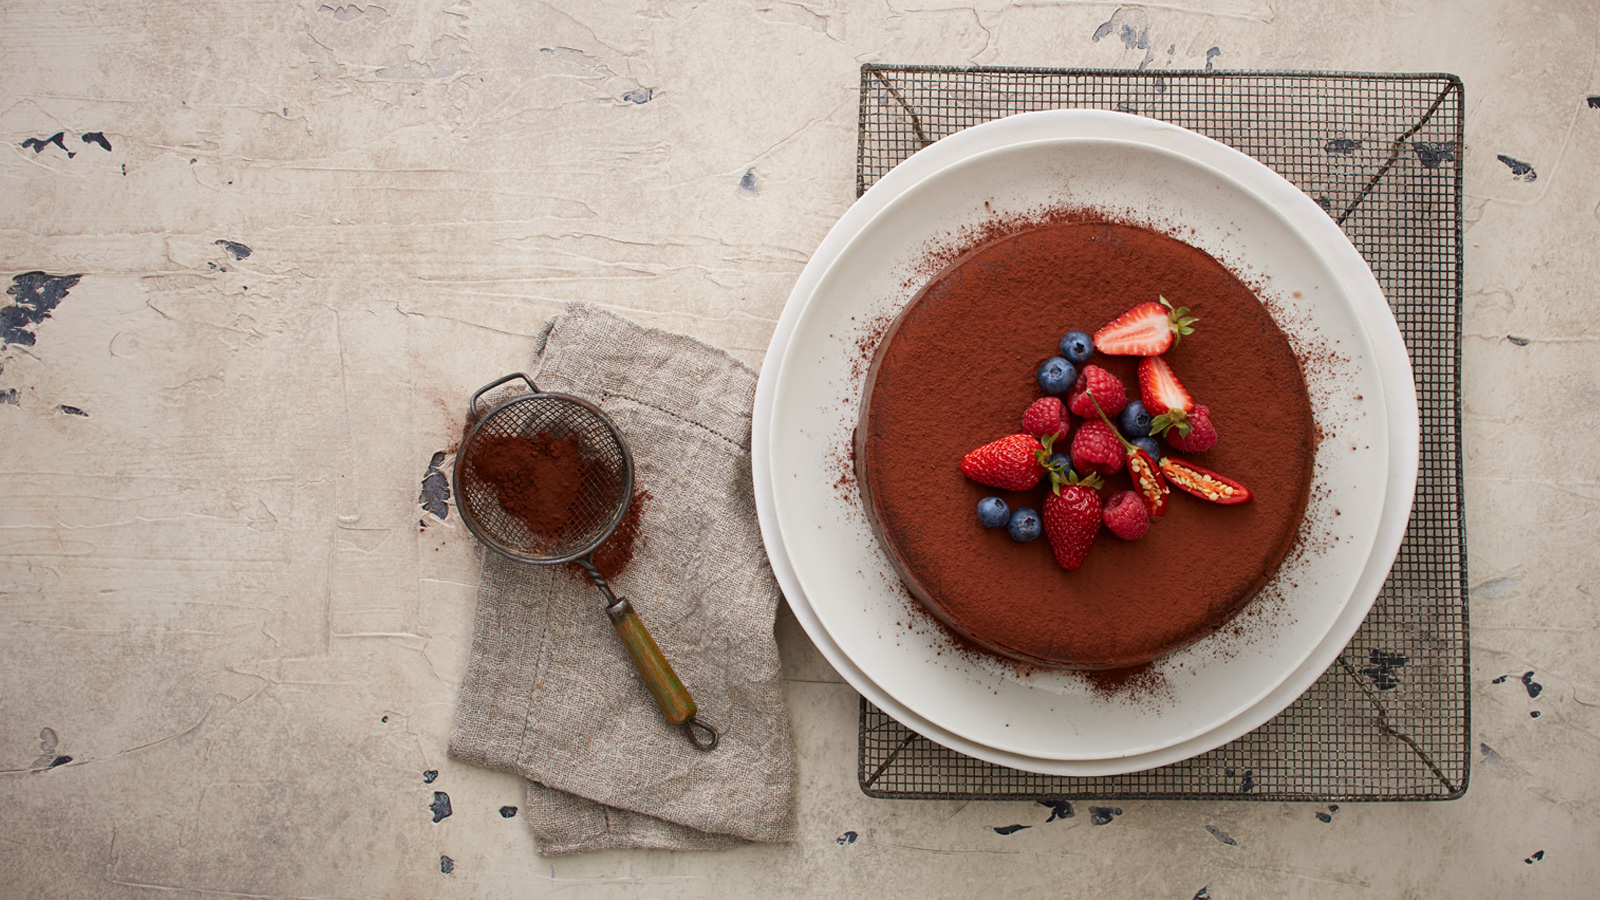 Chocolate Chilli Truffle Cake The Neff Kitchen